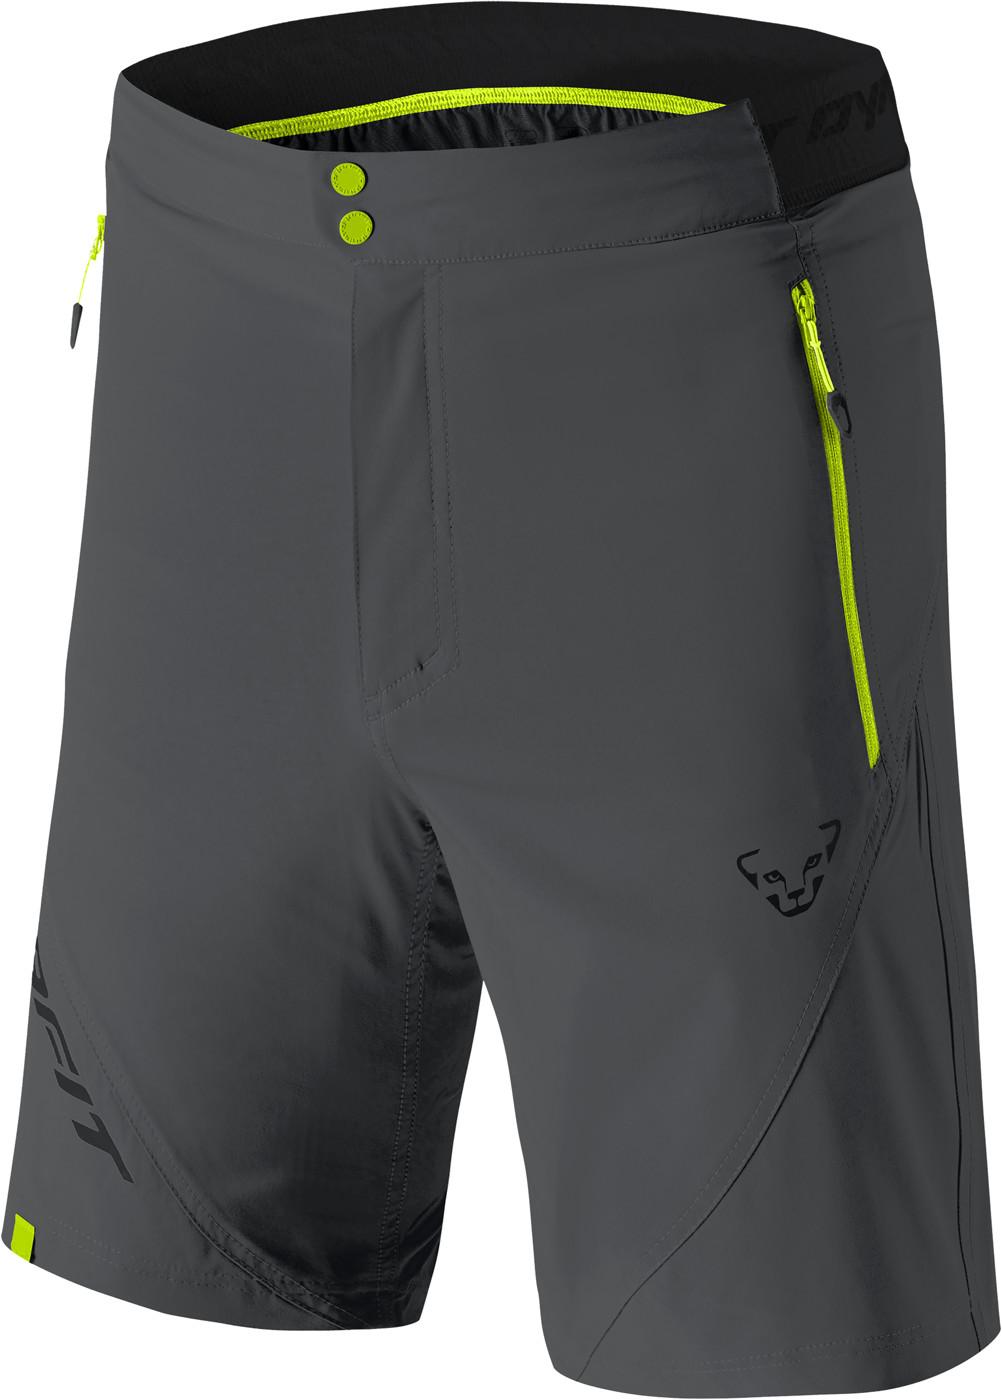 DYNAFIT Transalper Light Dynastretch Shorts - Herren